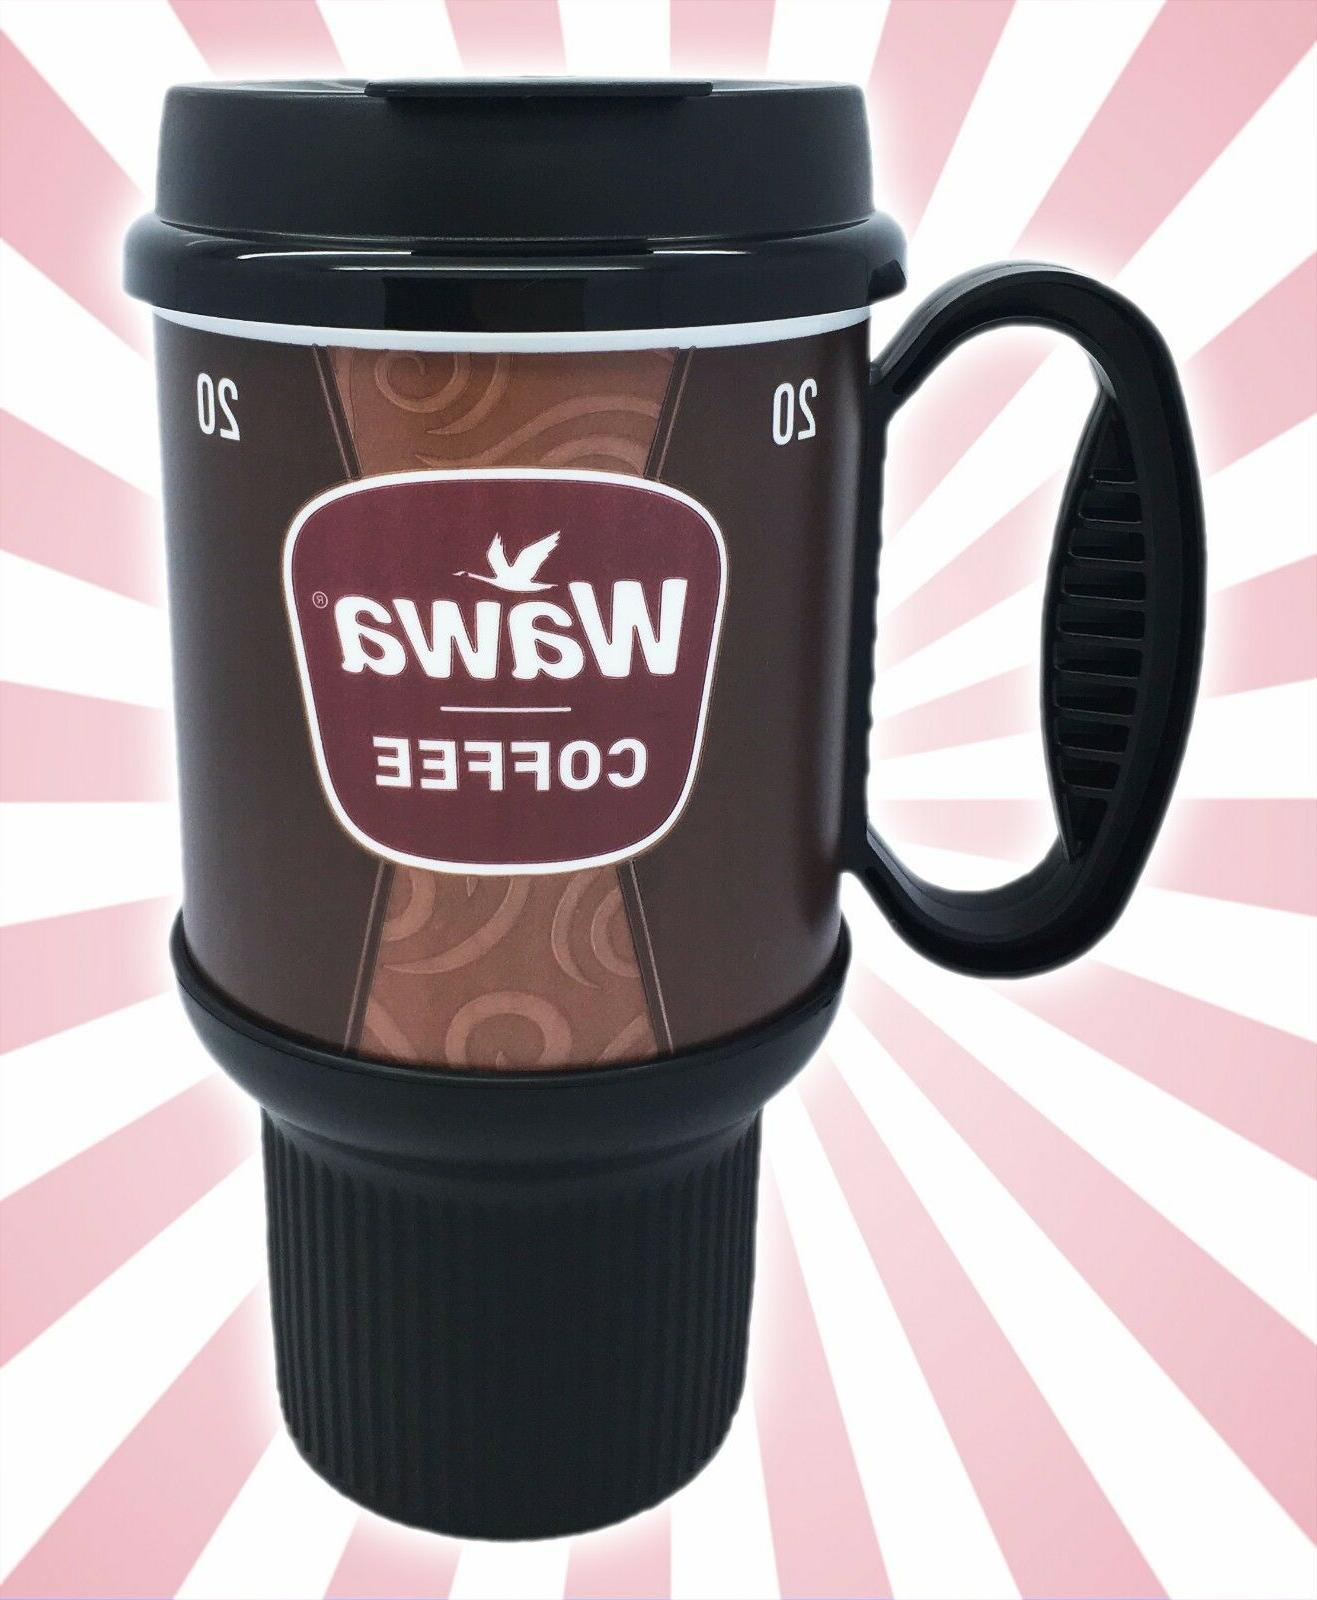 Wawa Gas Station Classic Coffee Mug Cup Brown Insulated Doub